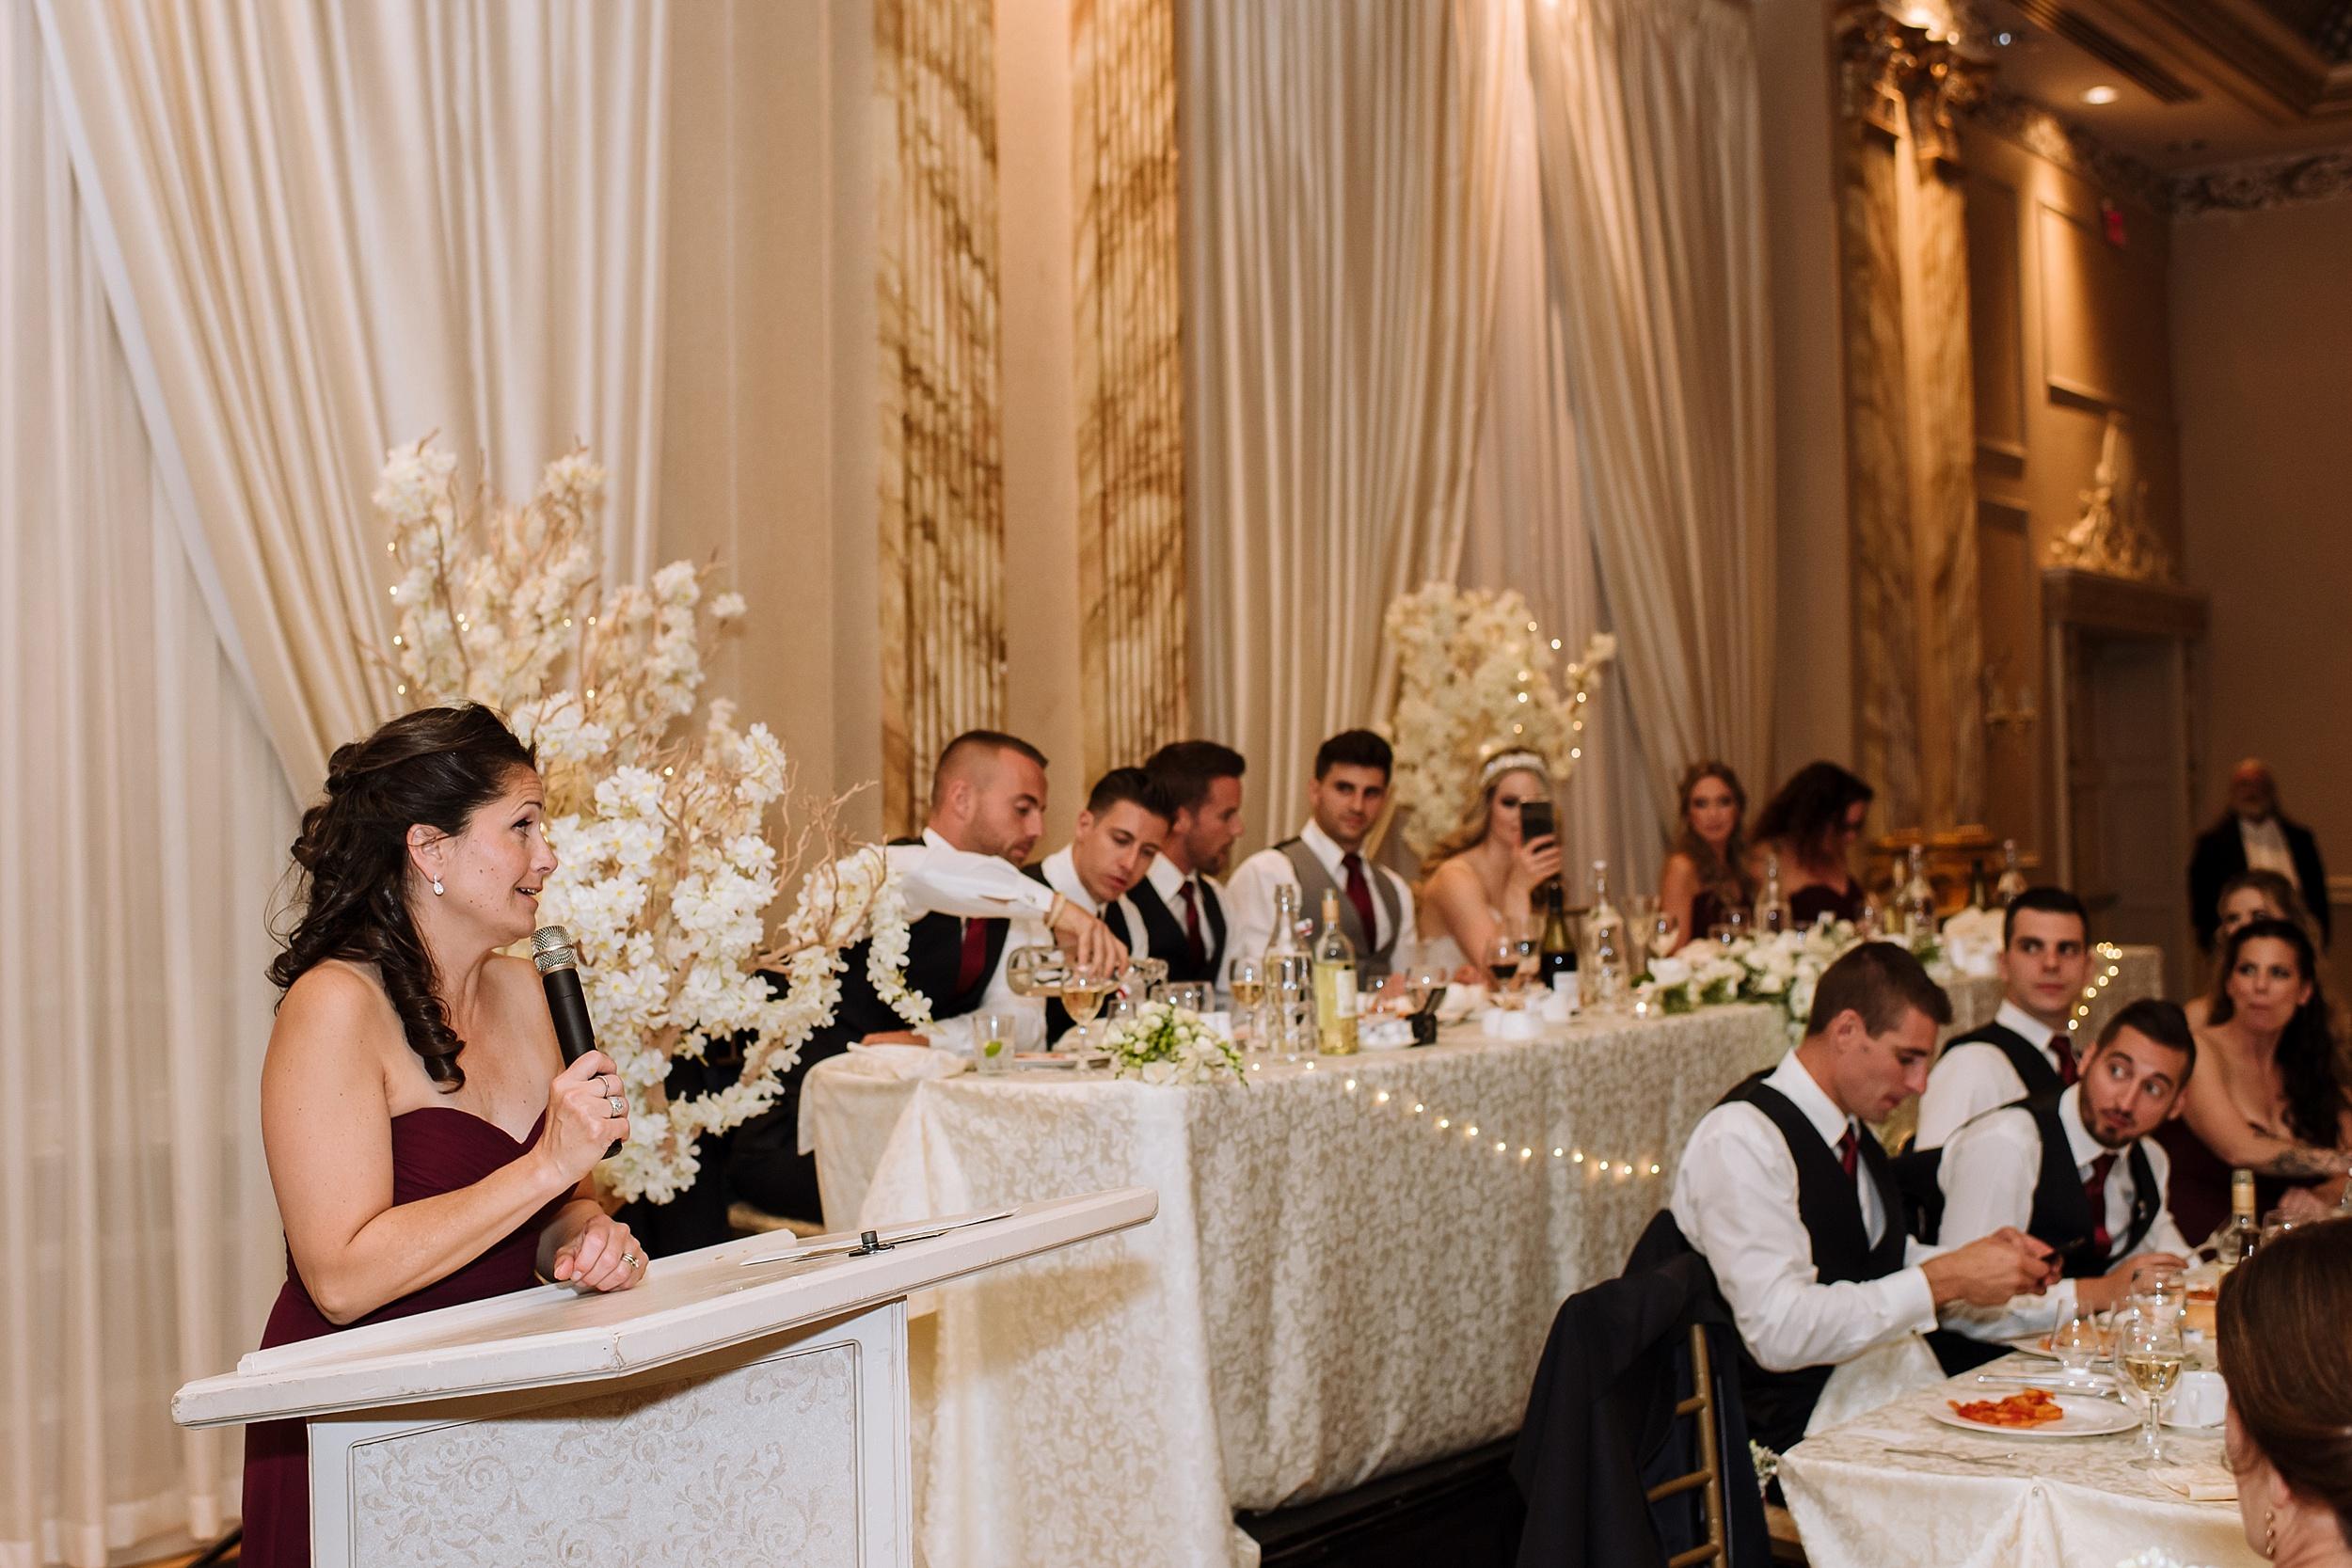 McMichael_Art_Collection_Wedding_chateau_le_jardin_Justine_Munro_Toronto_Photographer073.jpg